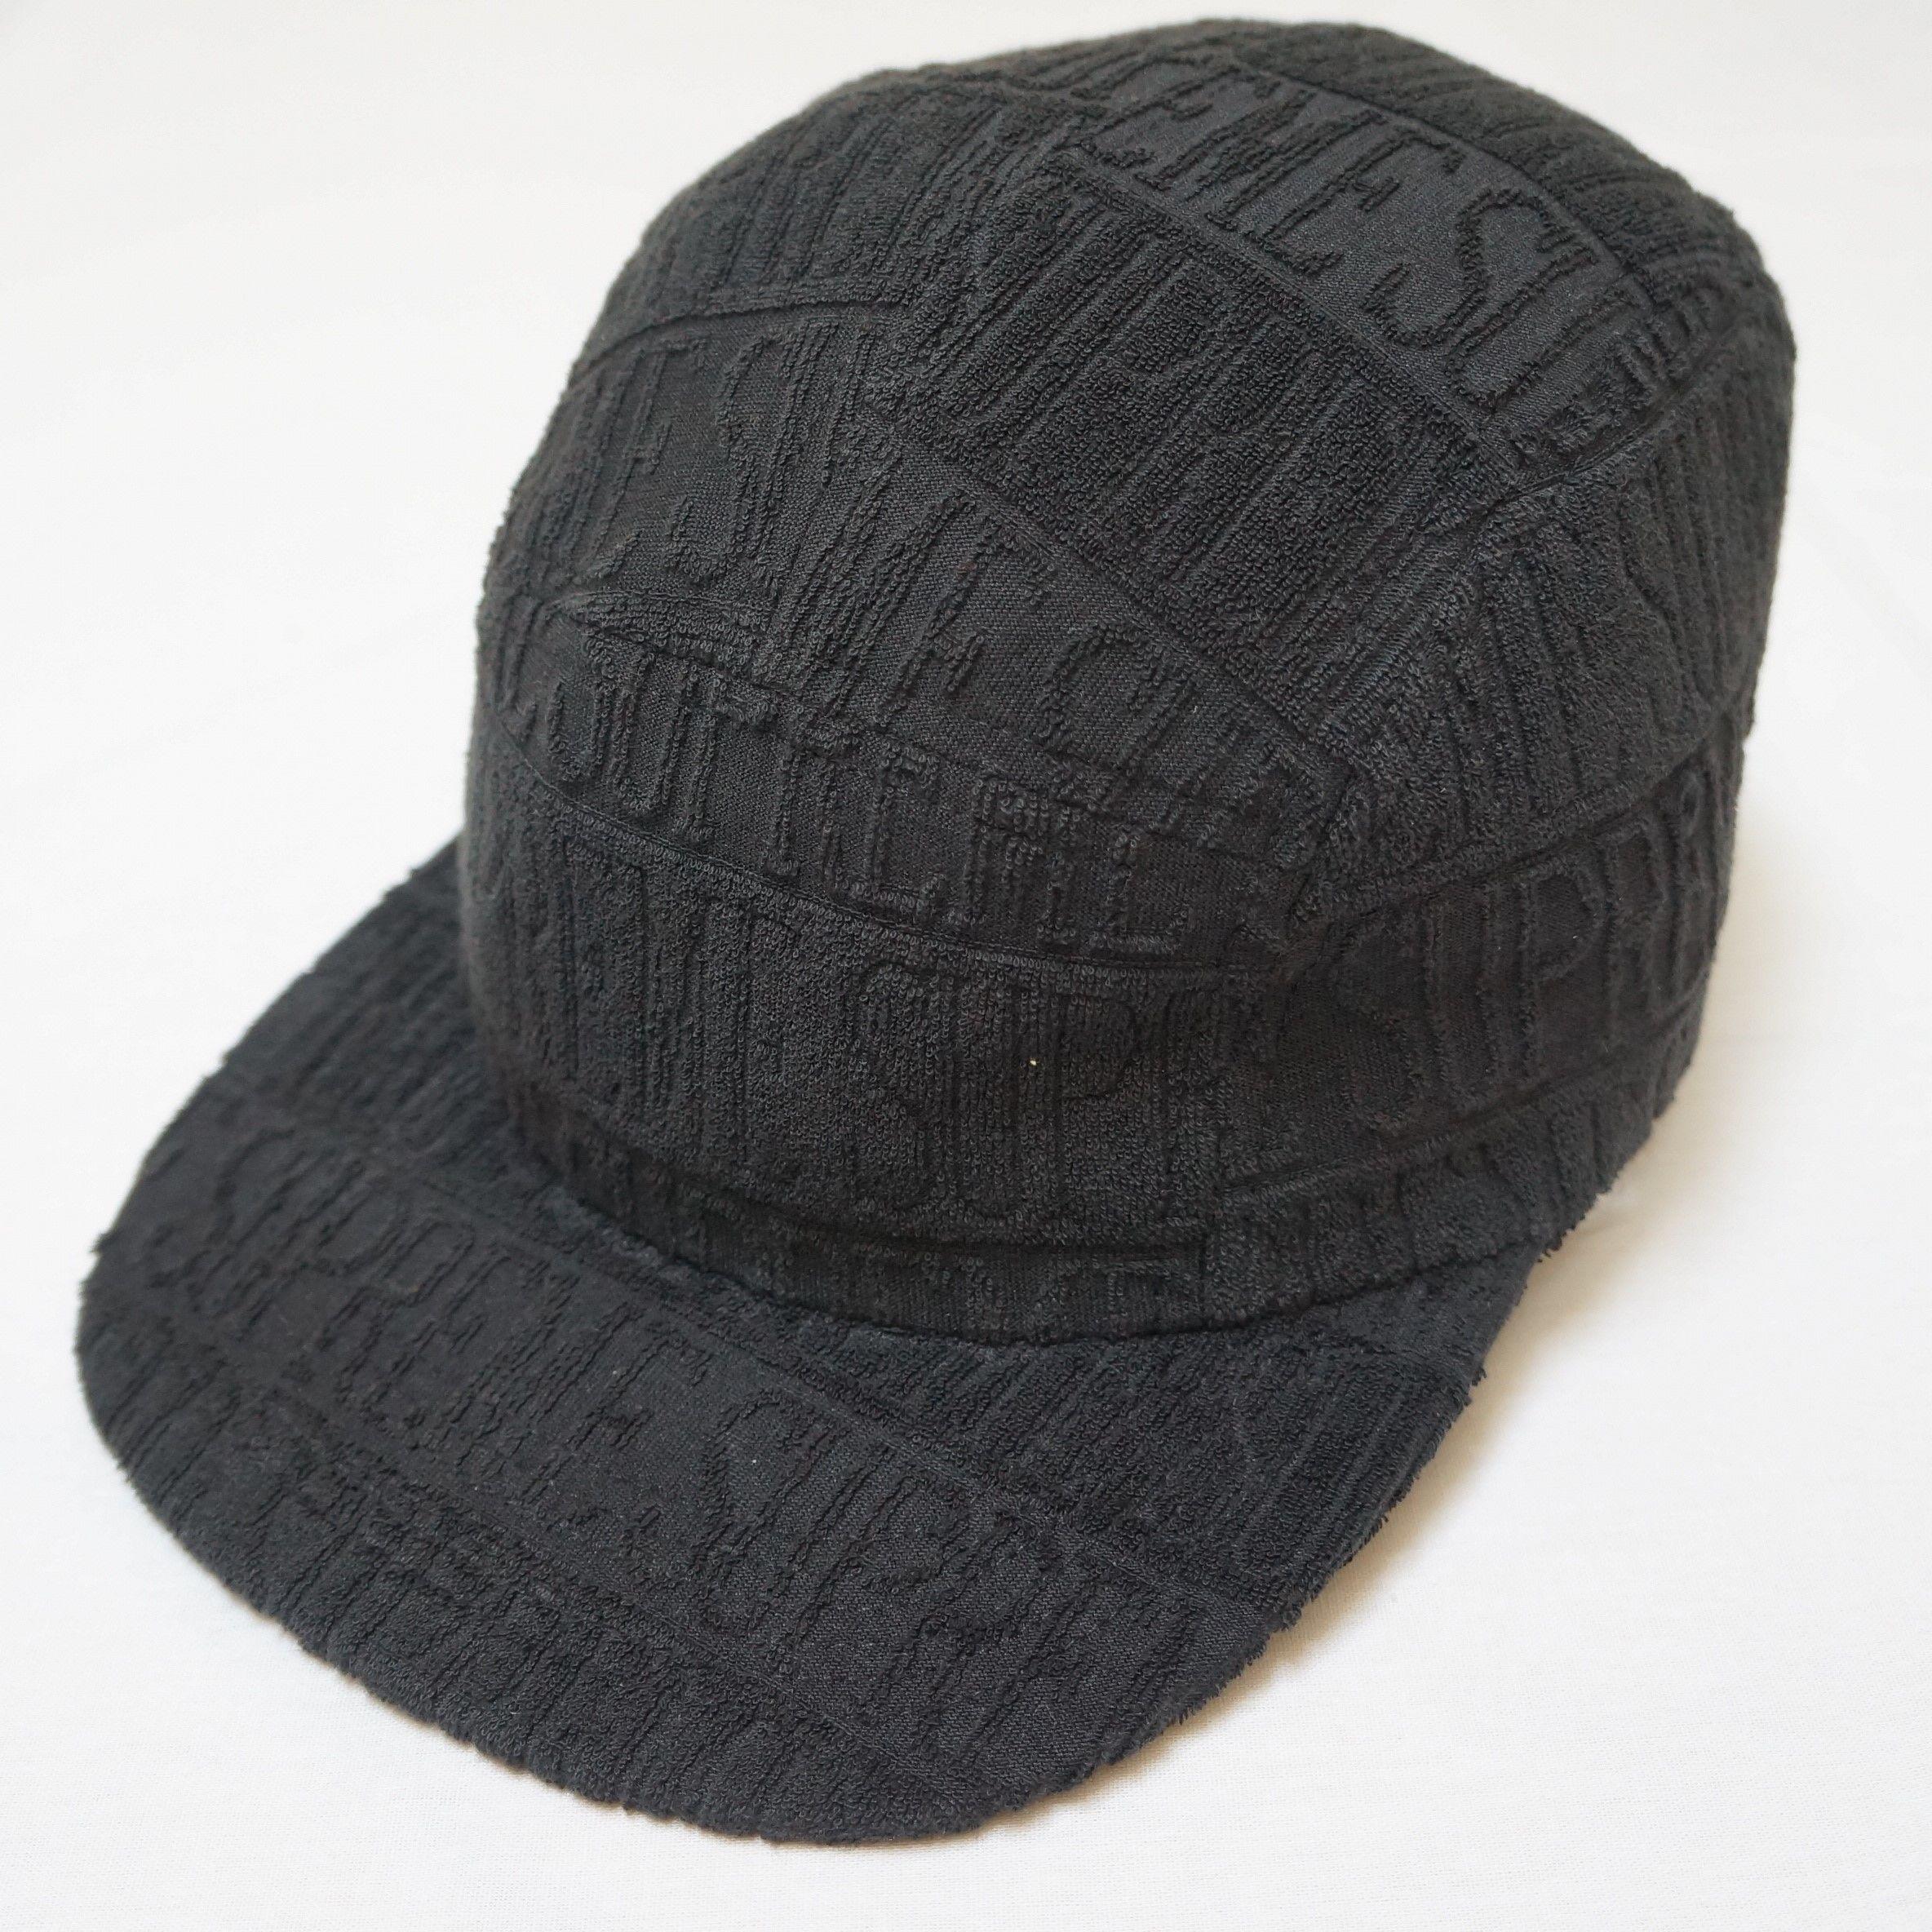 SUPREME CAP  Black Text Stripe Terry